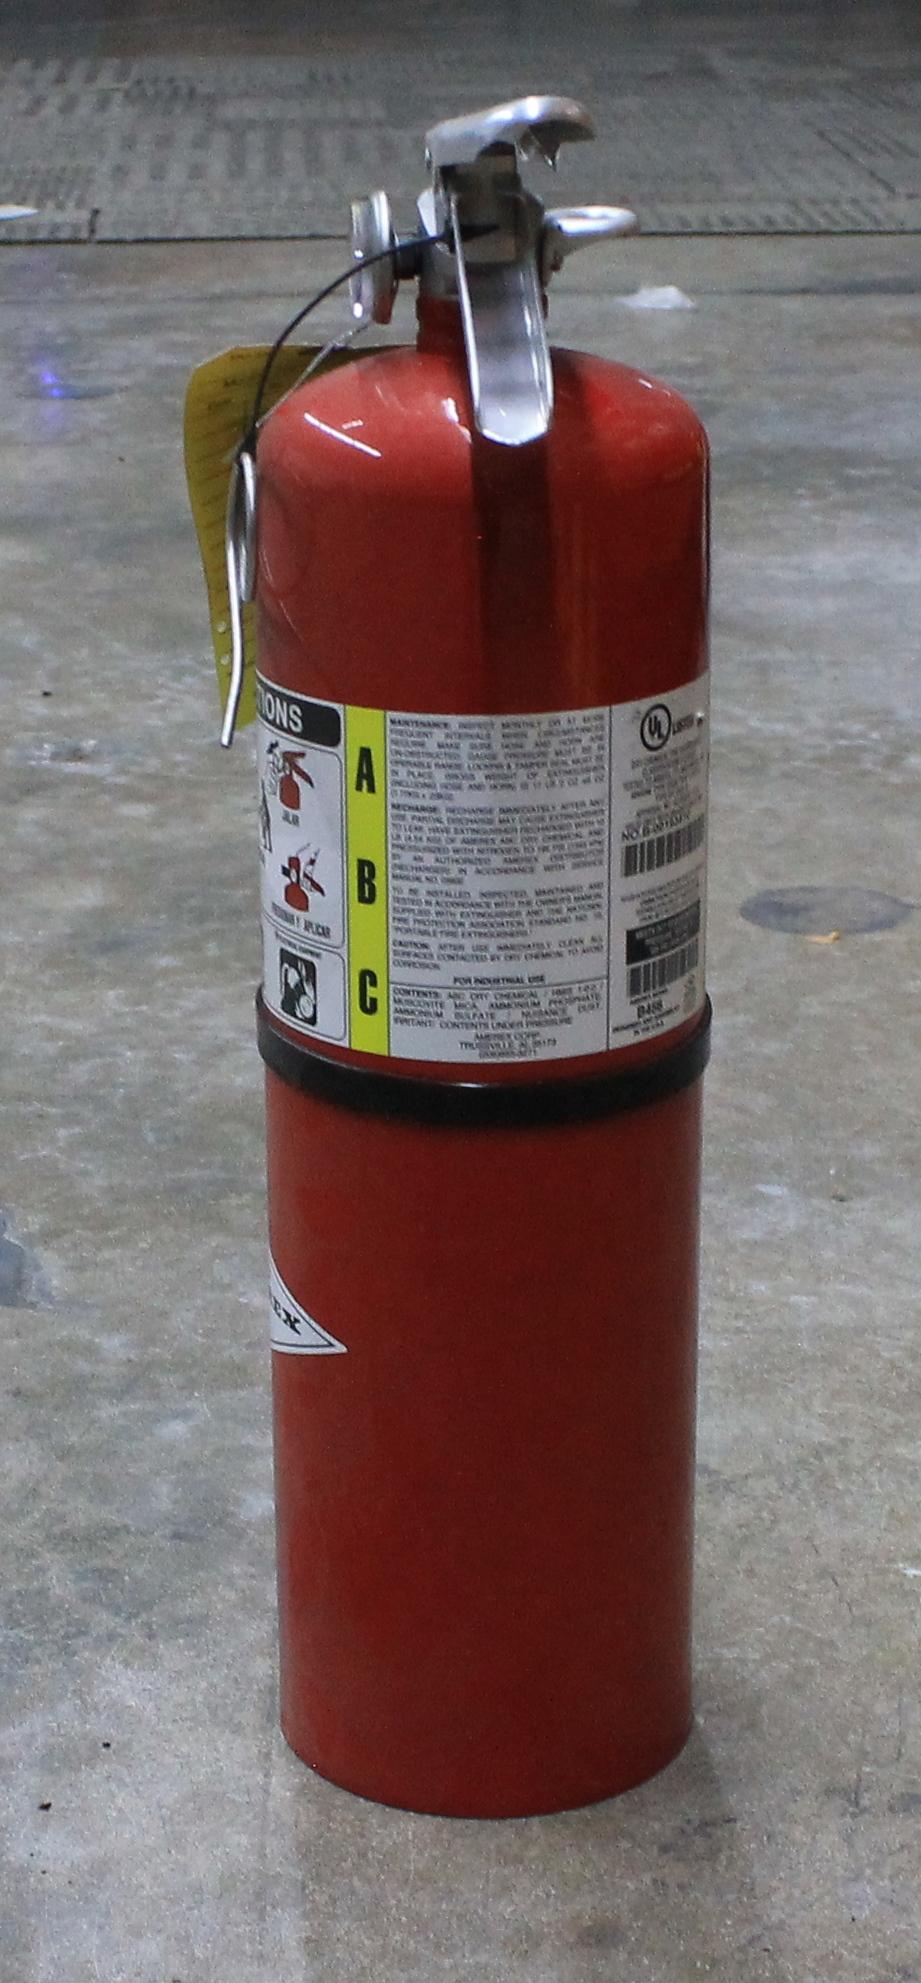 Lot 61 - 5 PCS OF FIRE EXTINGUISHER - CLASS ABC 10LB